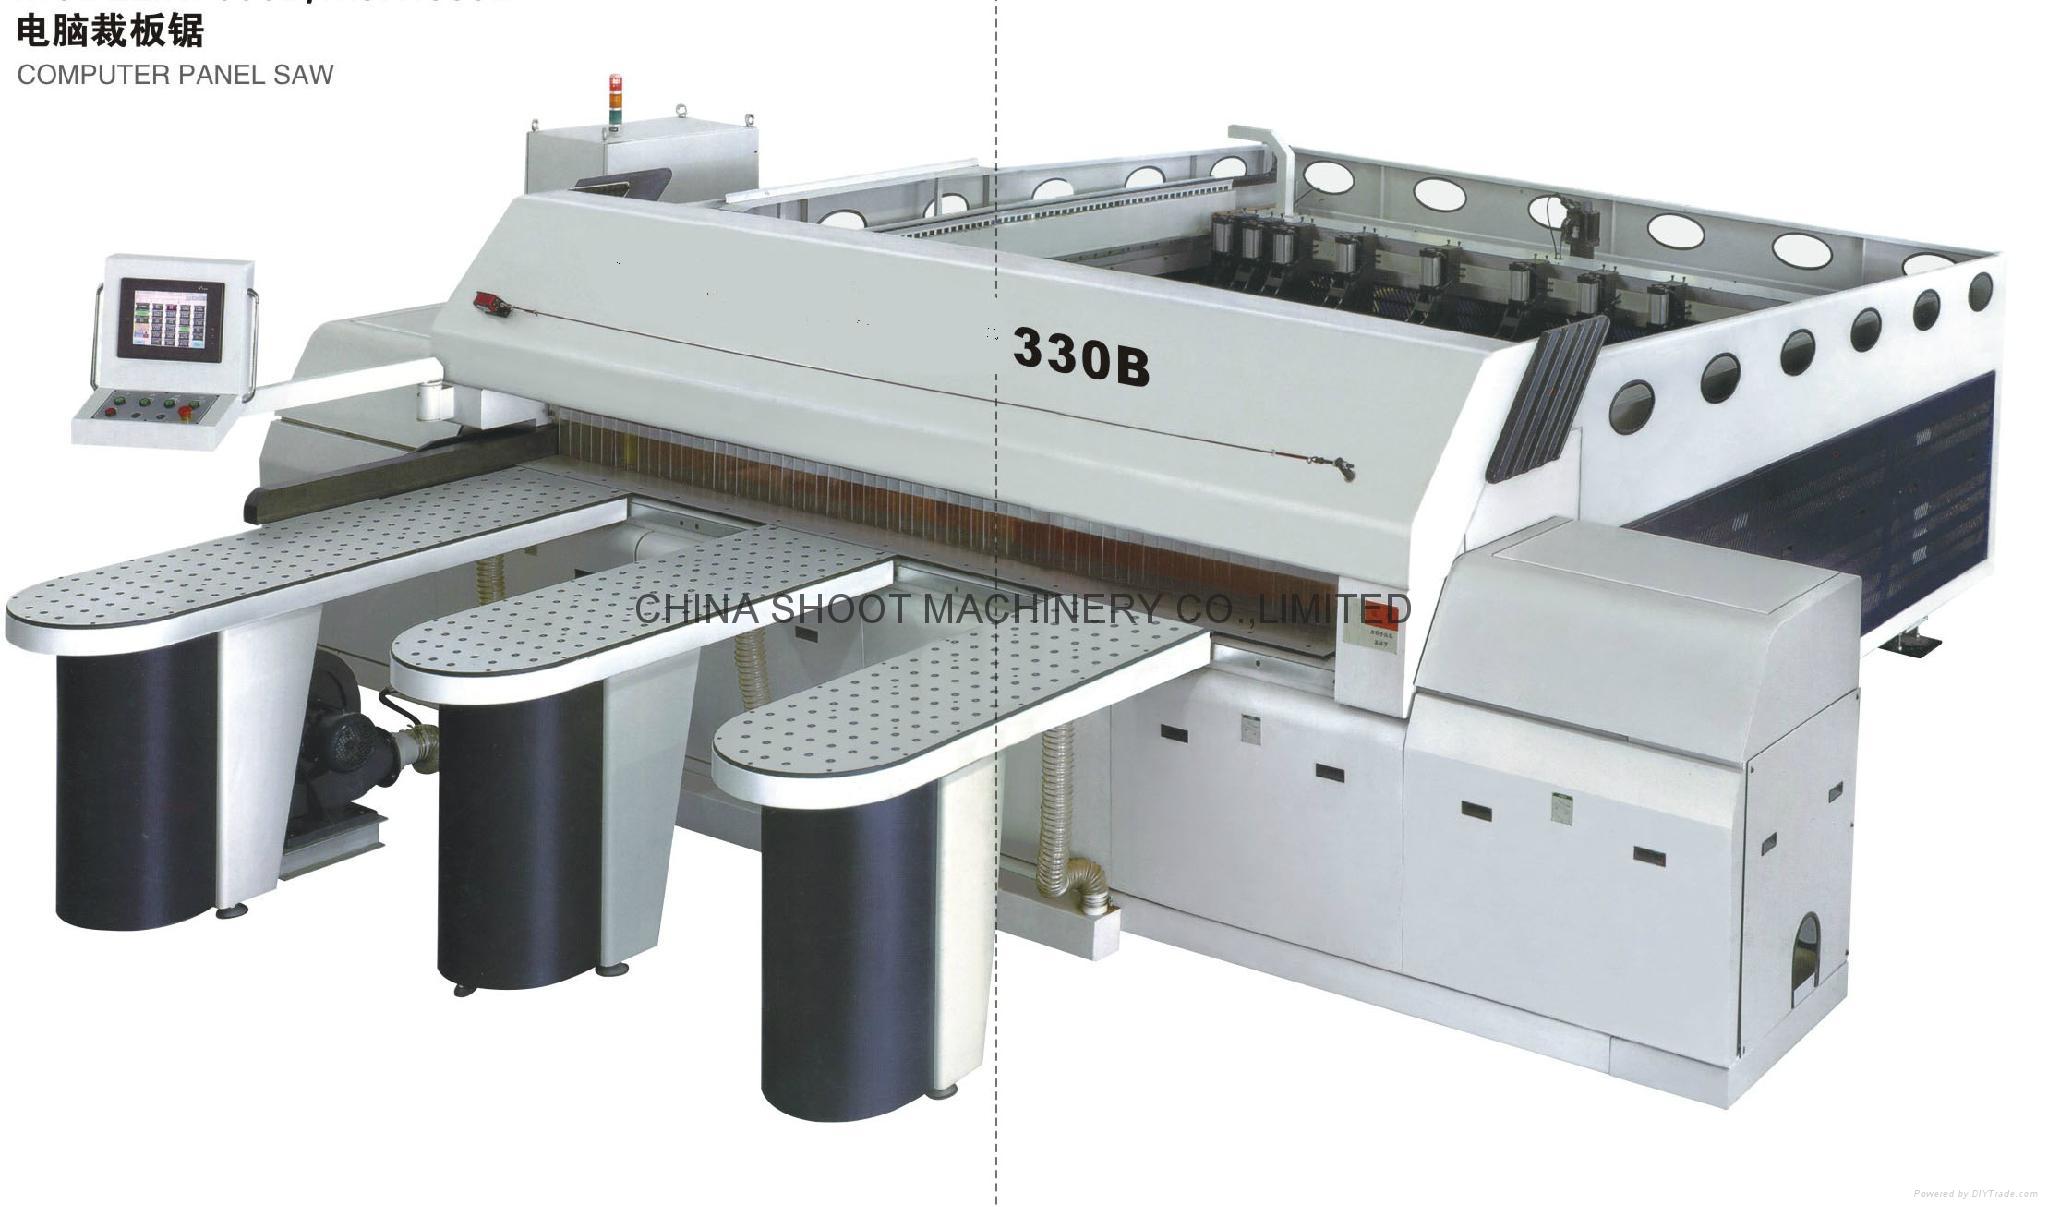 Full Automatic Computer Panel Saw Machine, SH330B 1